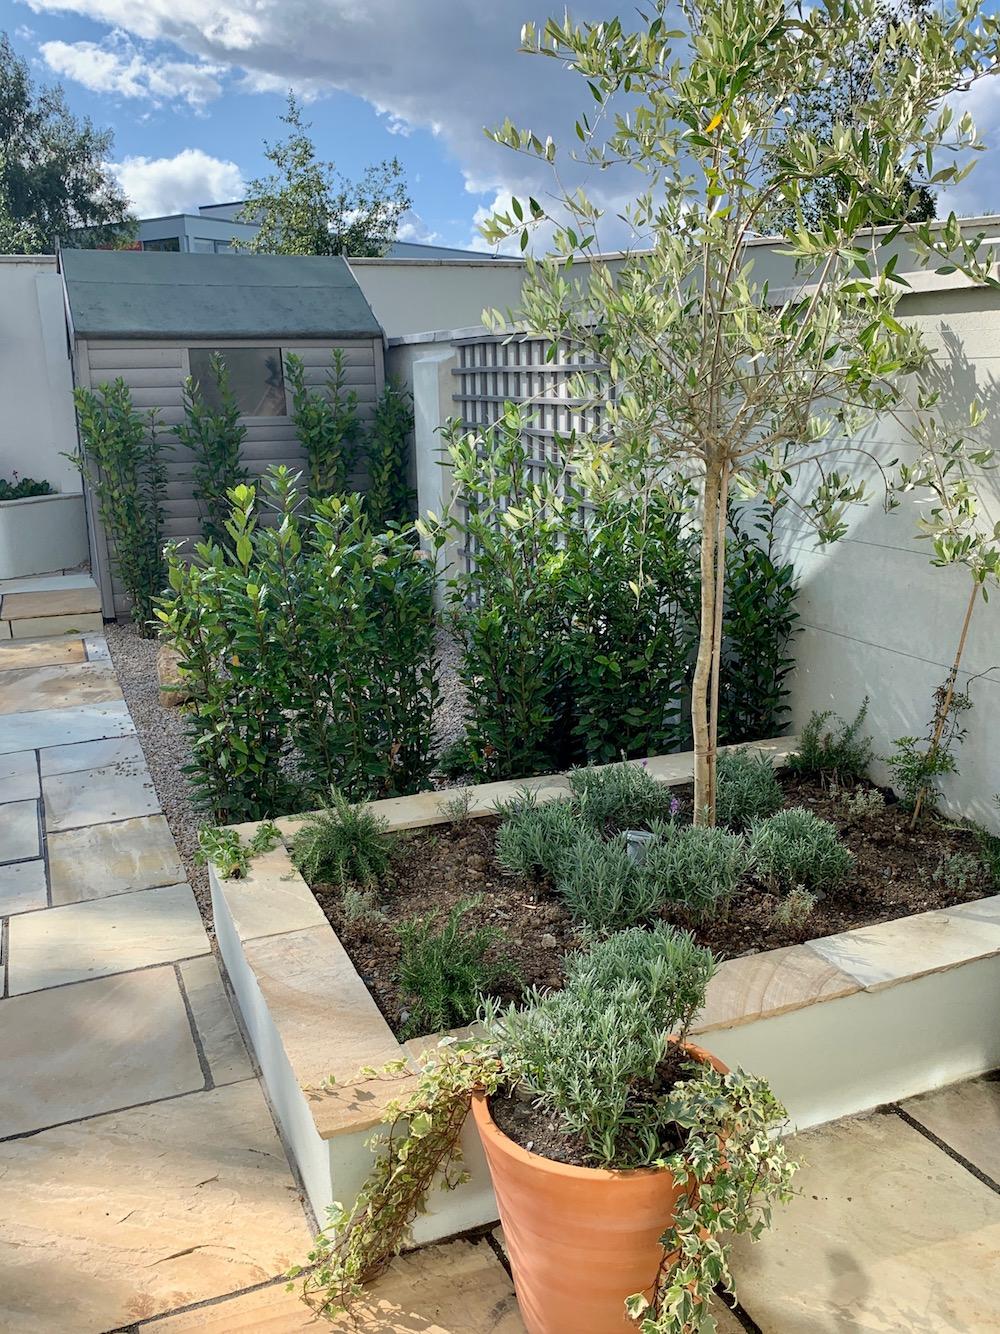 alex-alexandra-hollingsworth-garden-design-london-glenageary3.jpg